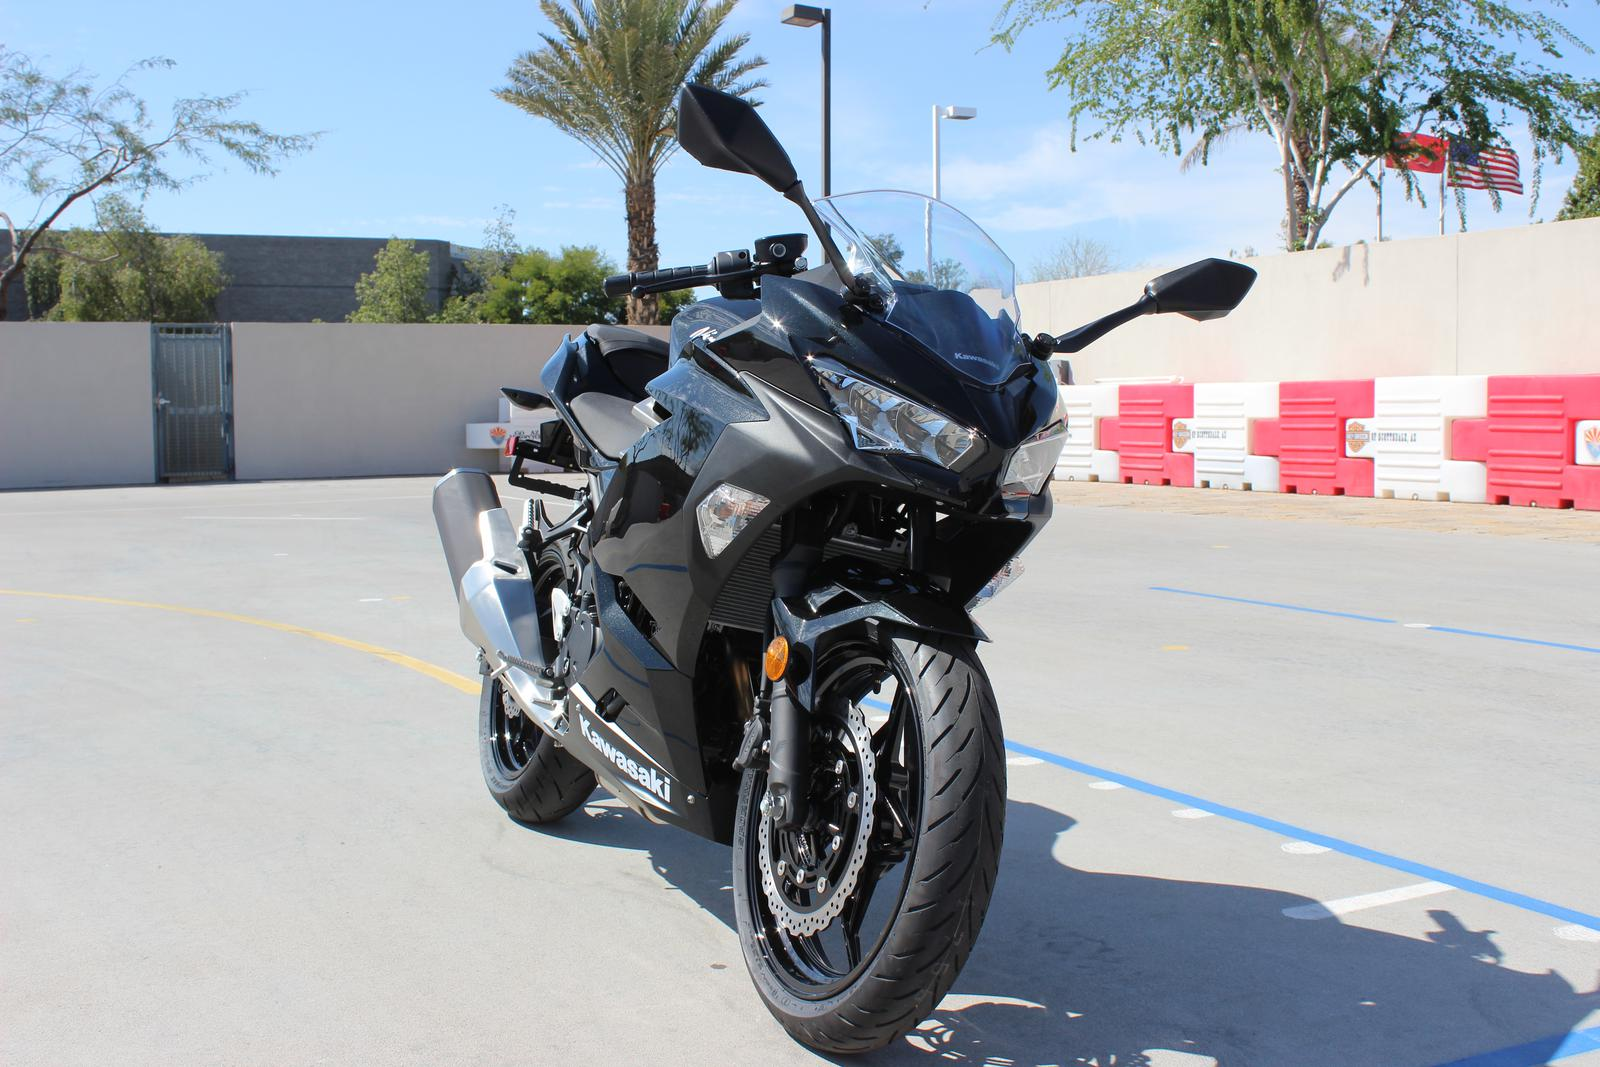 2019 Kawasaki Ninja 400 Abs For Sale In Scottsdale Az Go Az